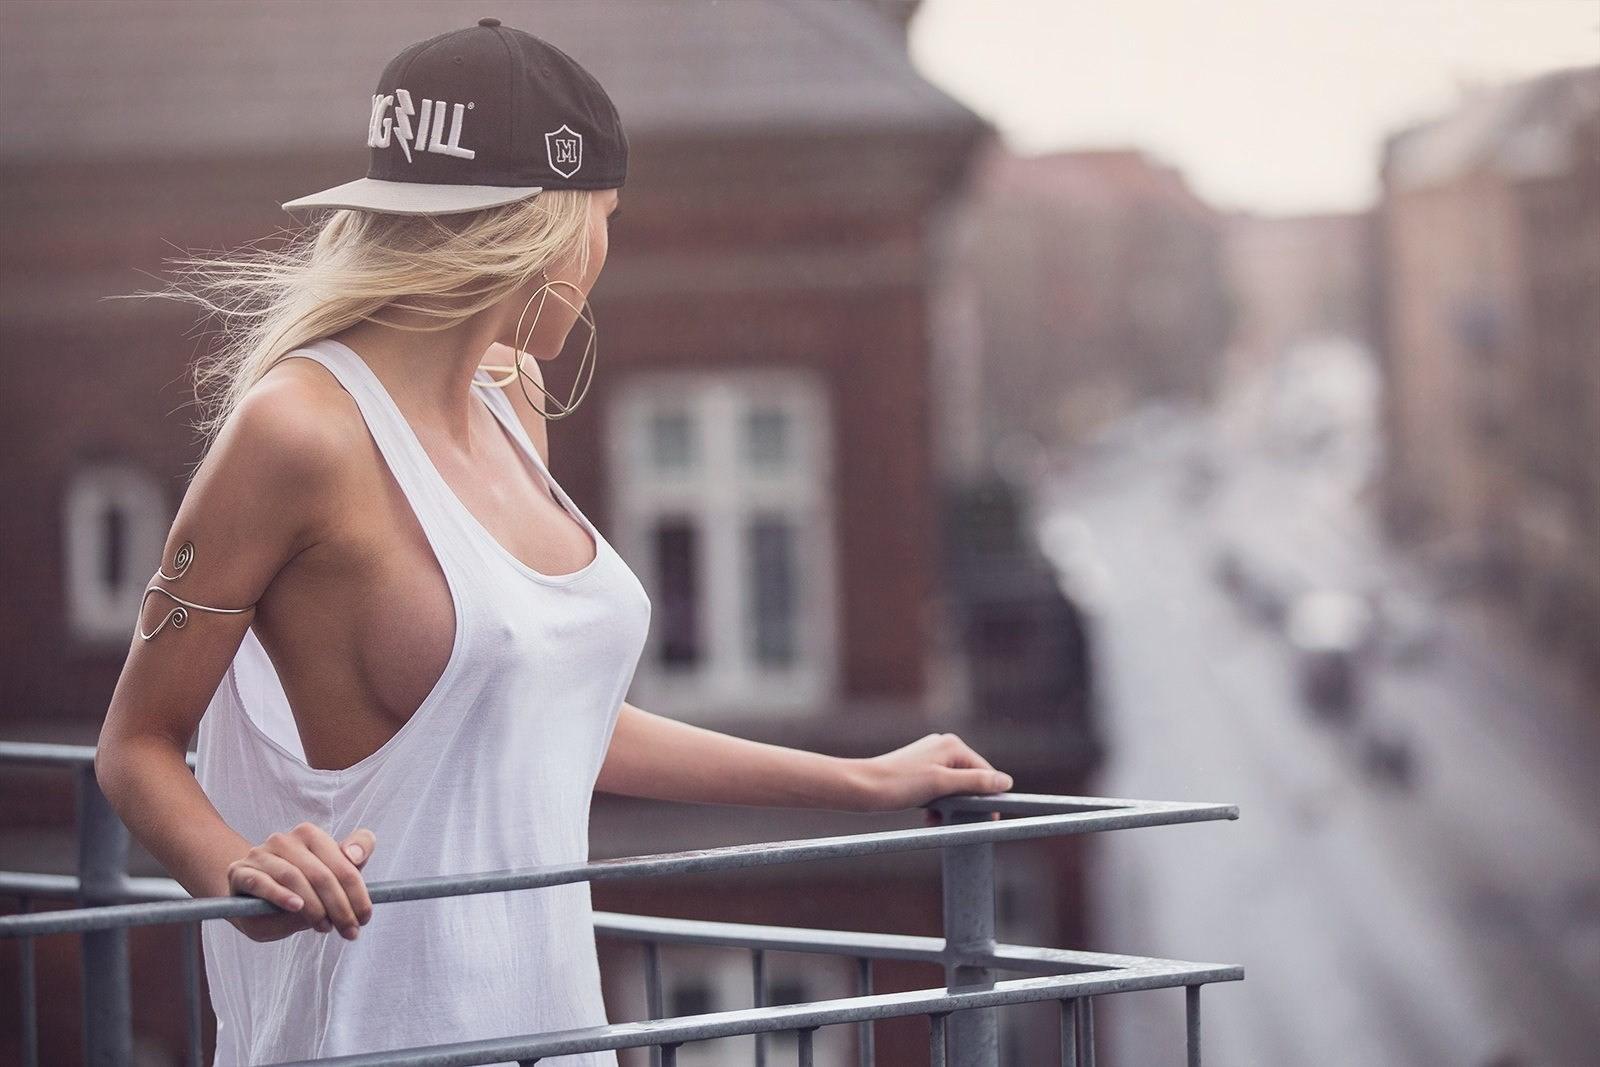 rap-video-girl-nude-hood-amature-nudes